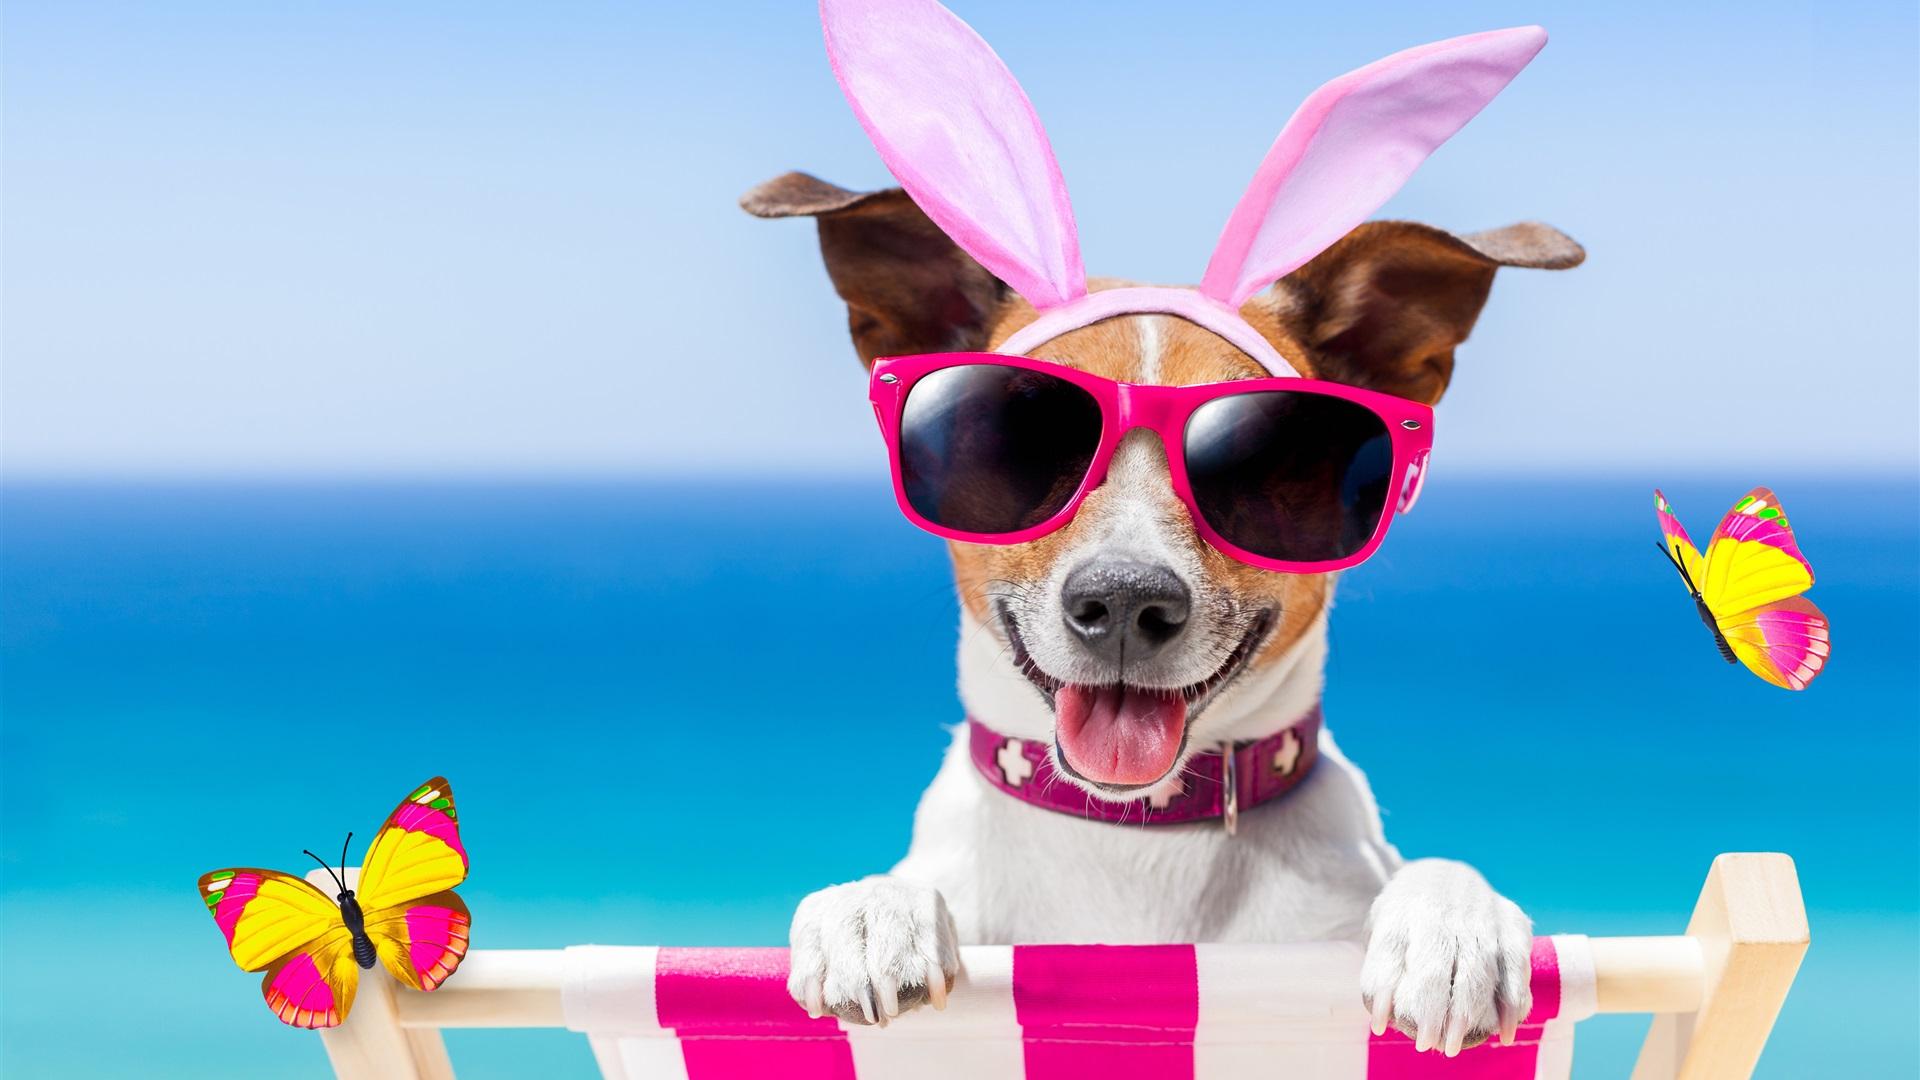 Fondos De Pantalla De Animales Graciosos: Perro Gracioso, Gafas, Mariposa, Verano Fondos De Pantalla